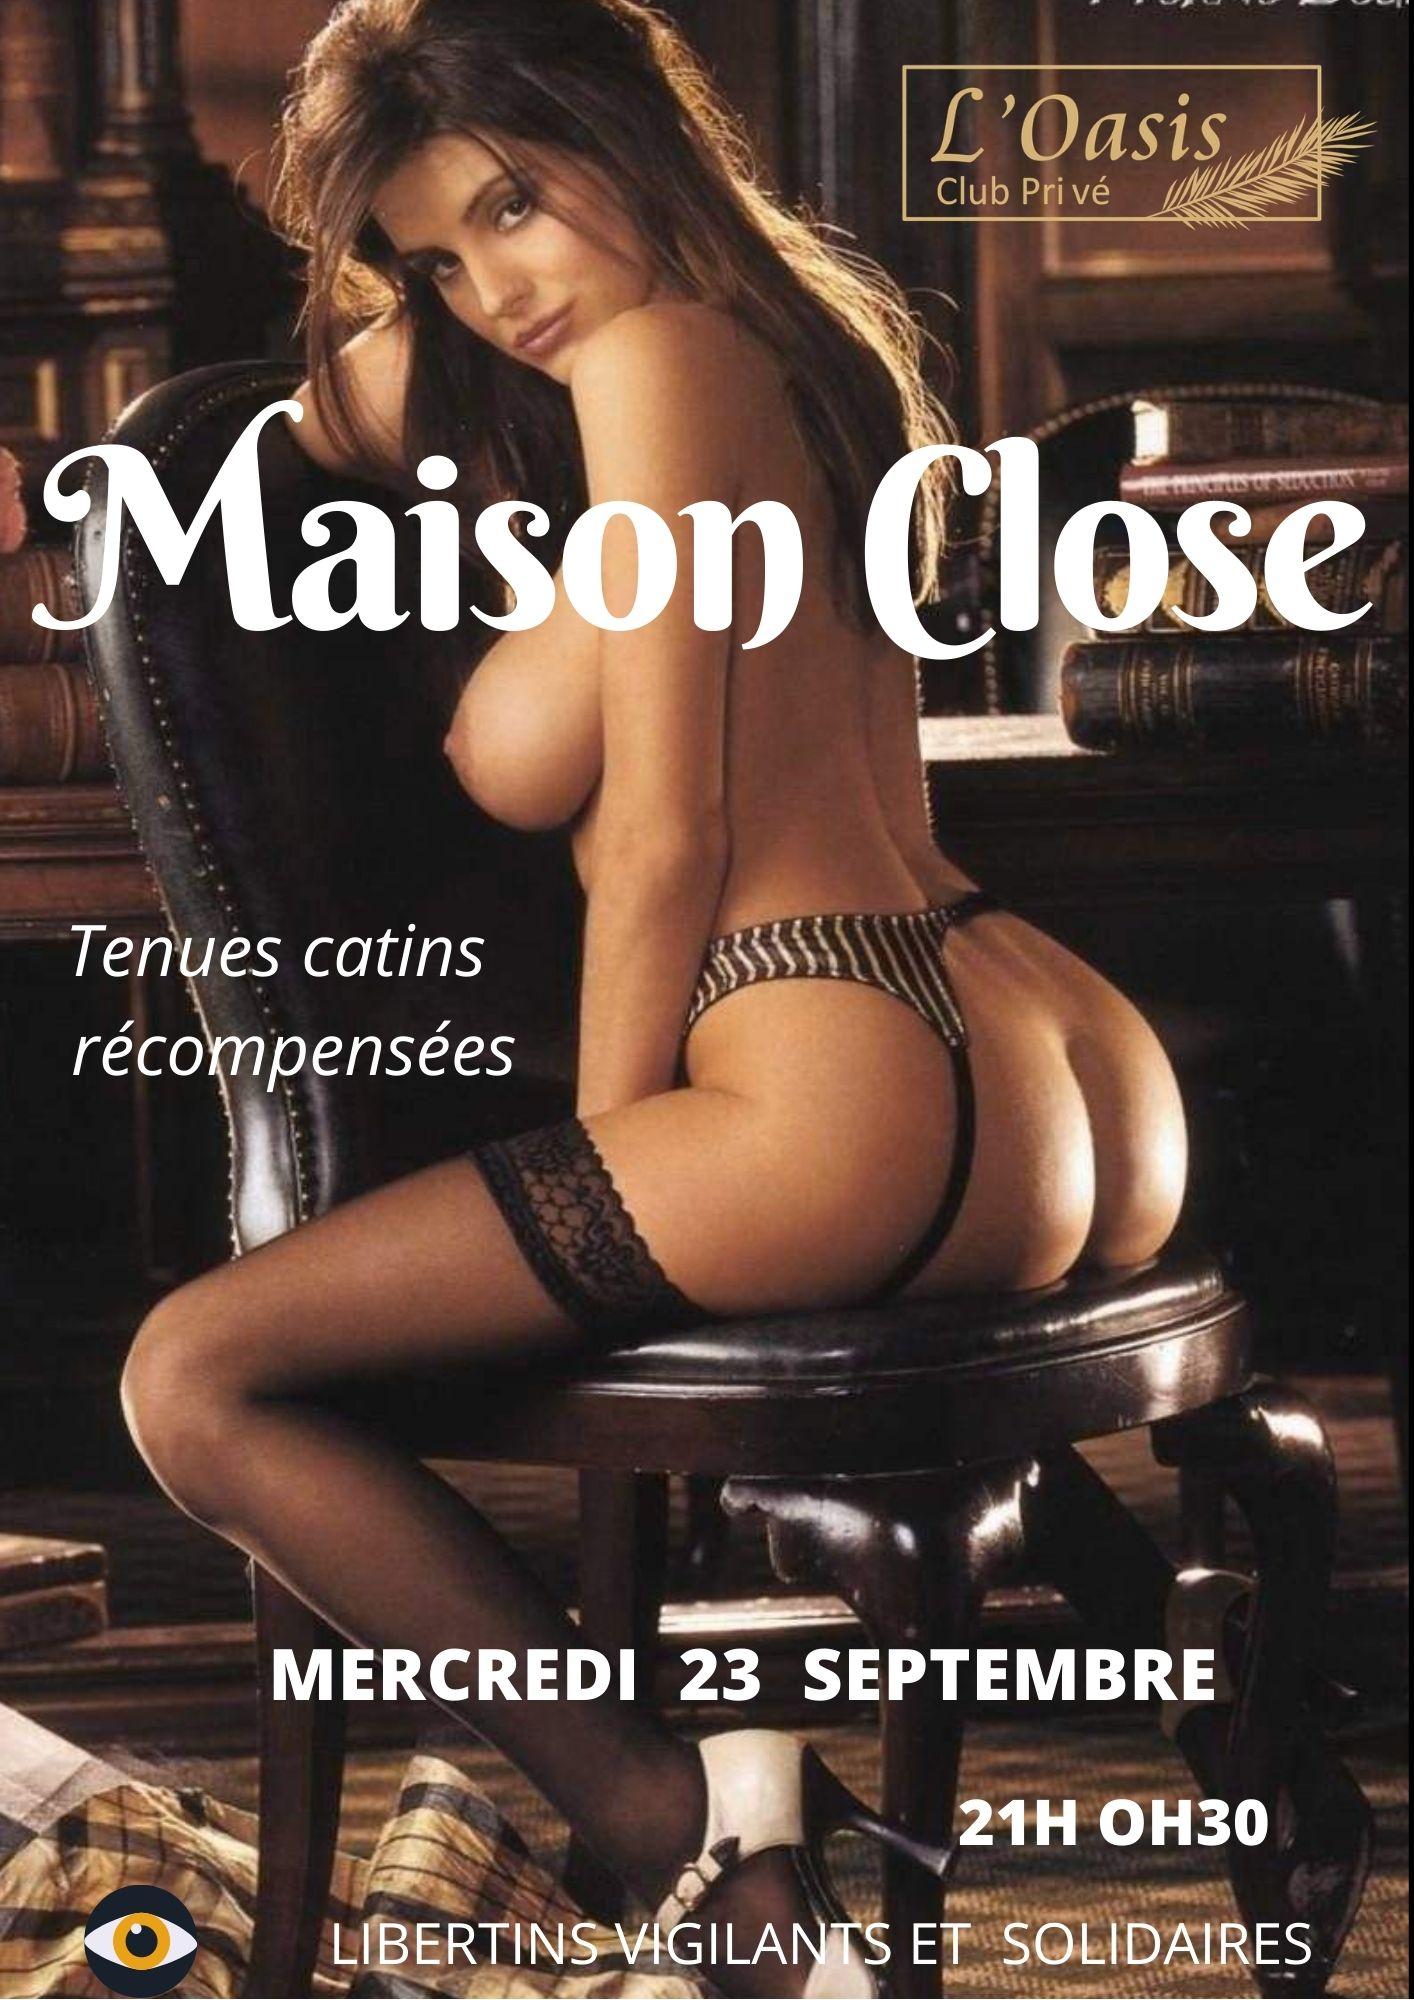 MERCREDI 16 SEPT MAISON CLOSE